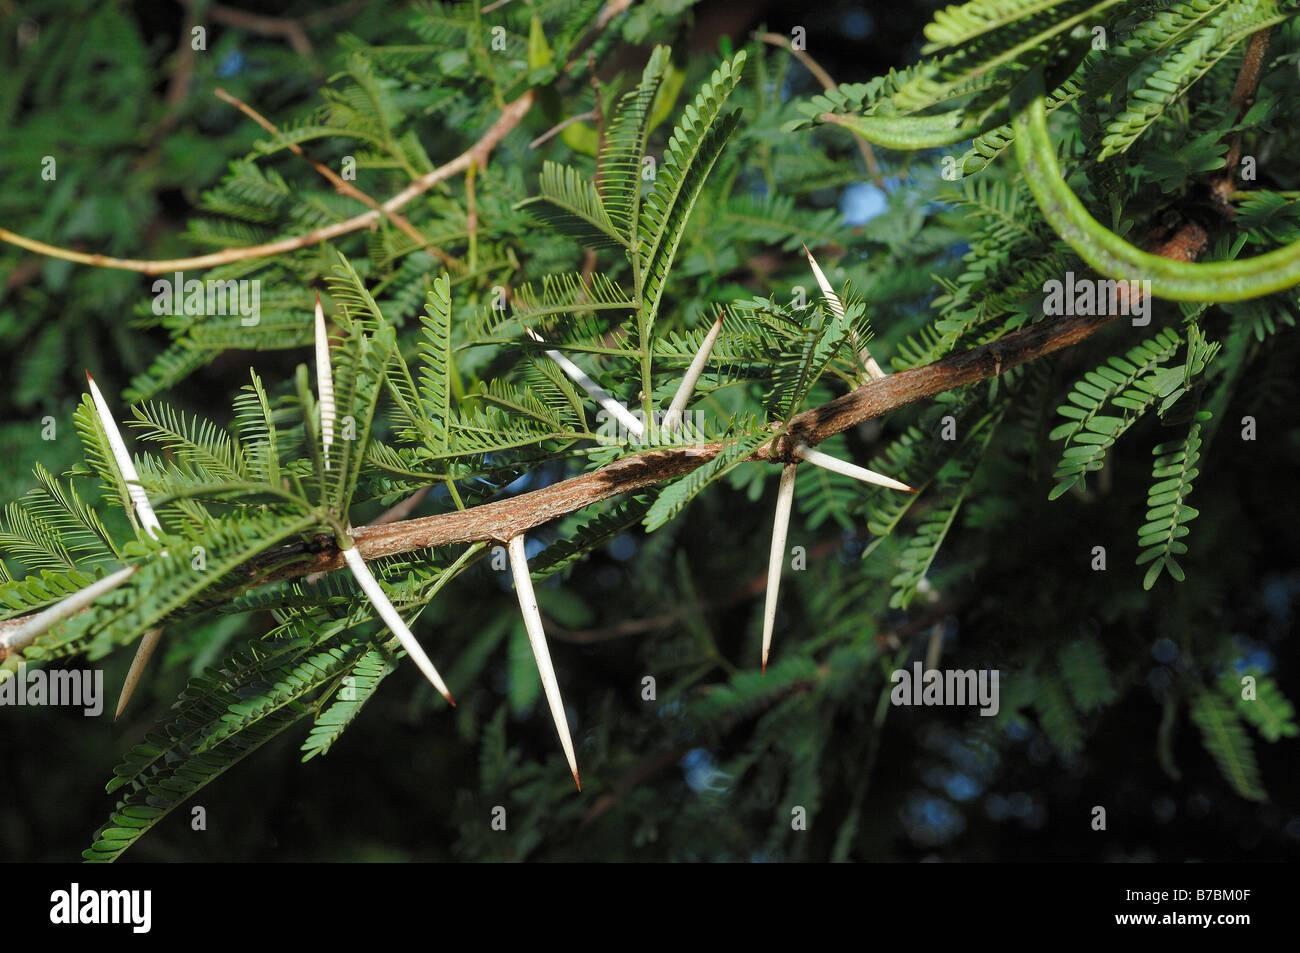 Acacia Karroo Detail Of Leaves And Fruits Stock Photo 21770127 Alamy